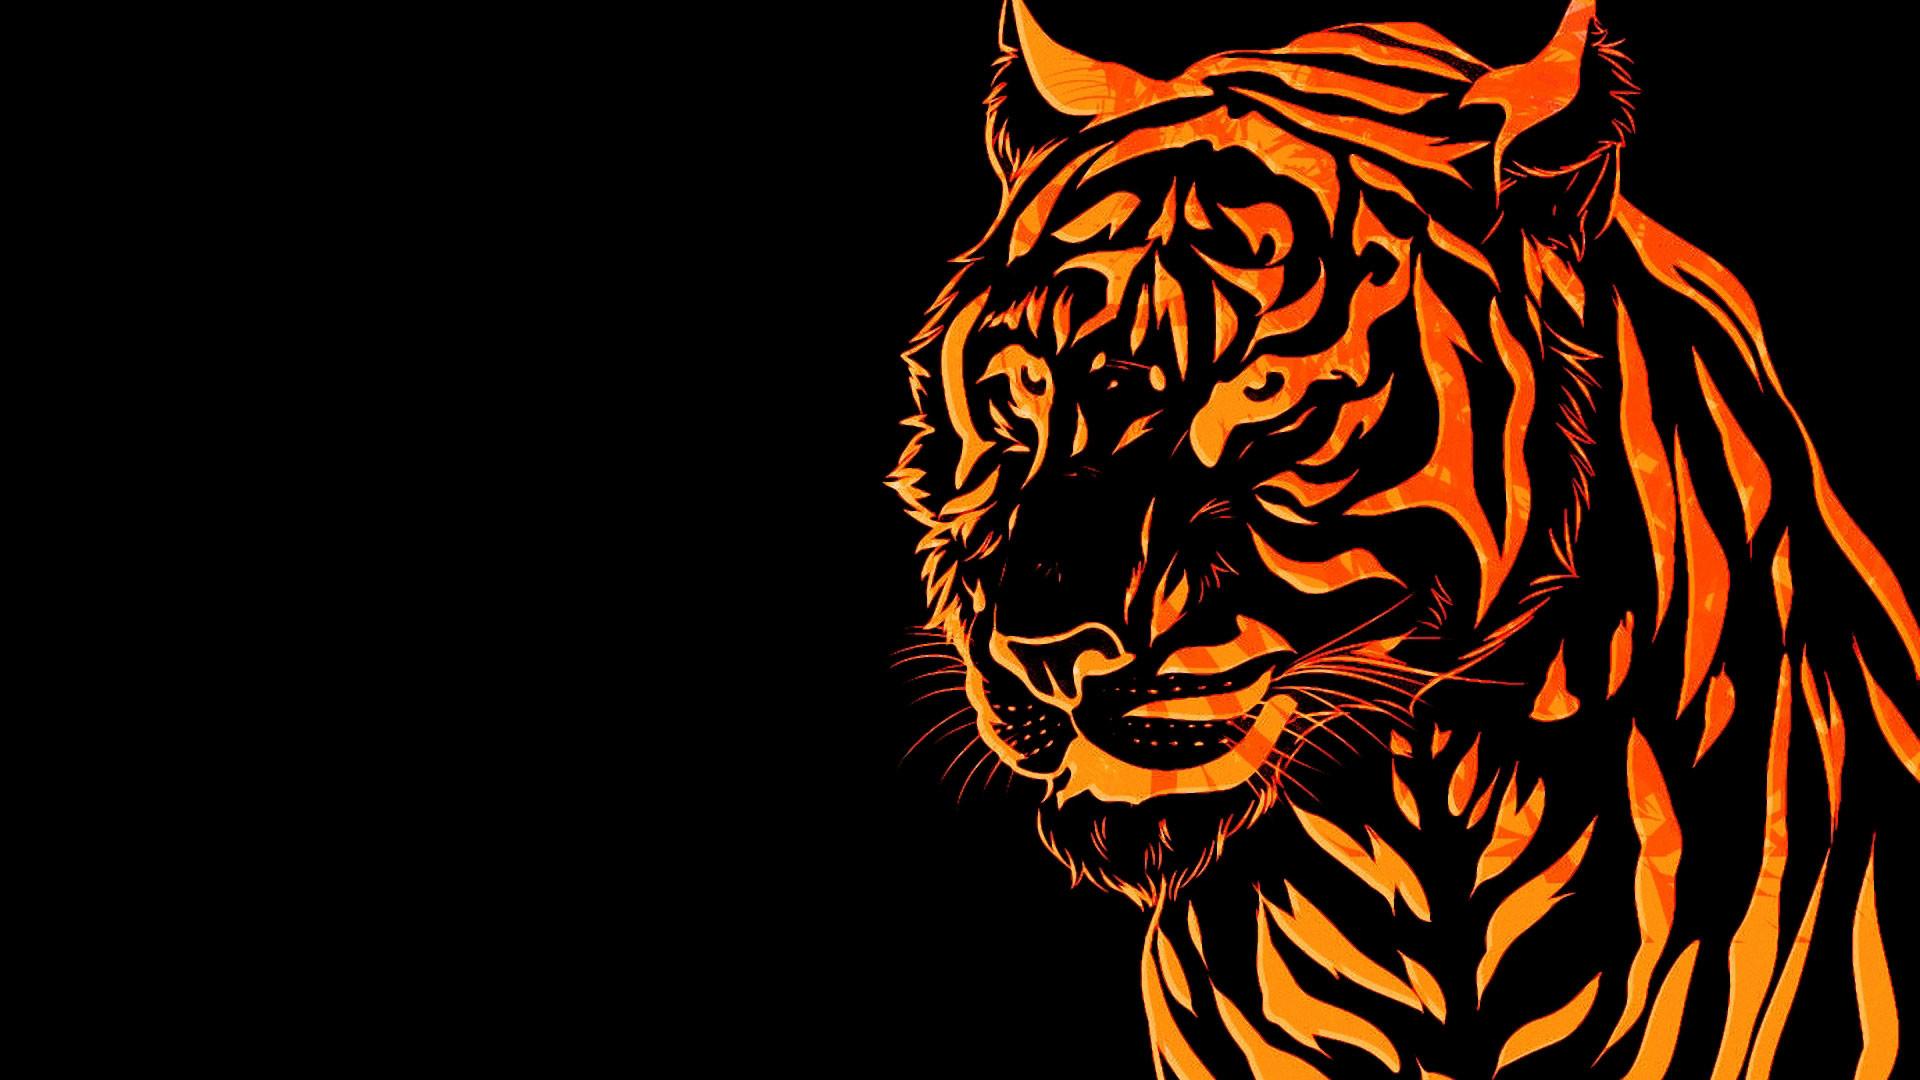 hd pics photos beautiful tiger skin lines orange neon hd quality desktop  background wallpaper